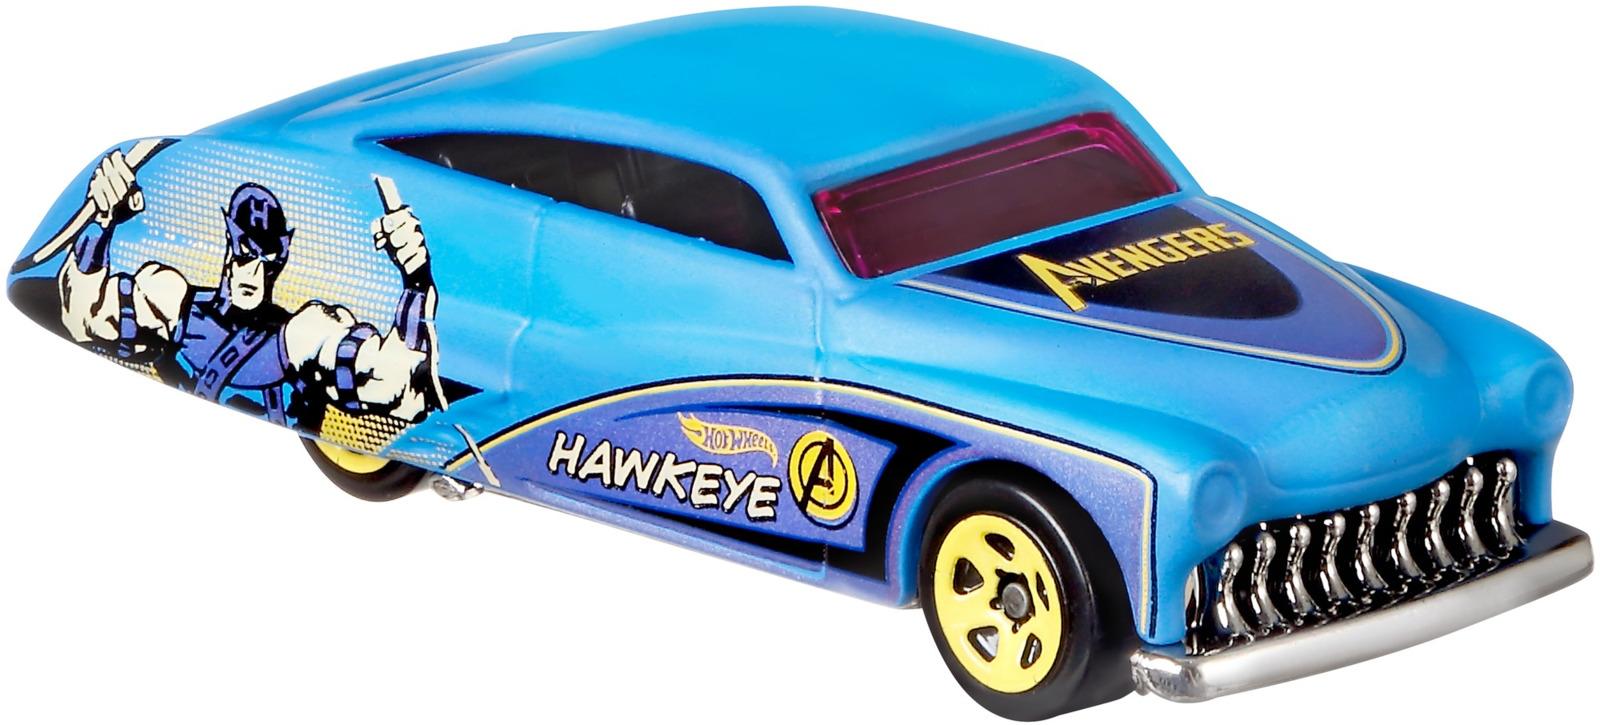 Hot Wheels Трековые машинки Мстители 3 Purple Passion цены онлайн